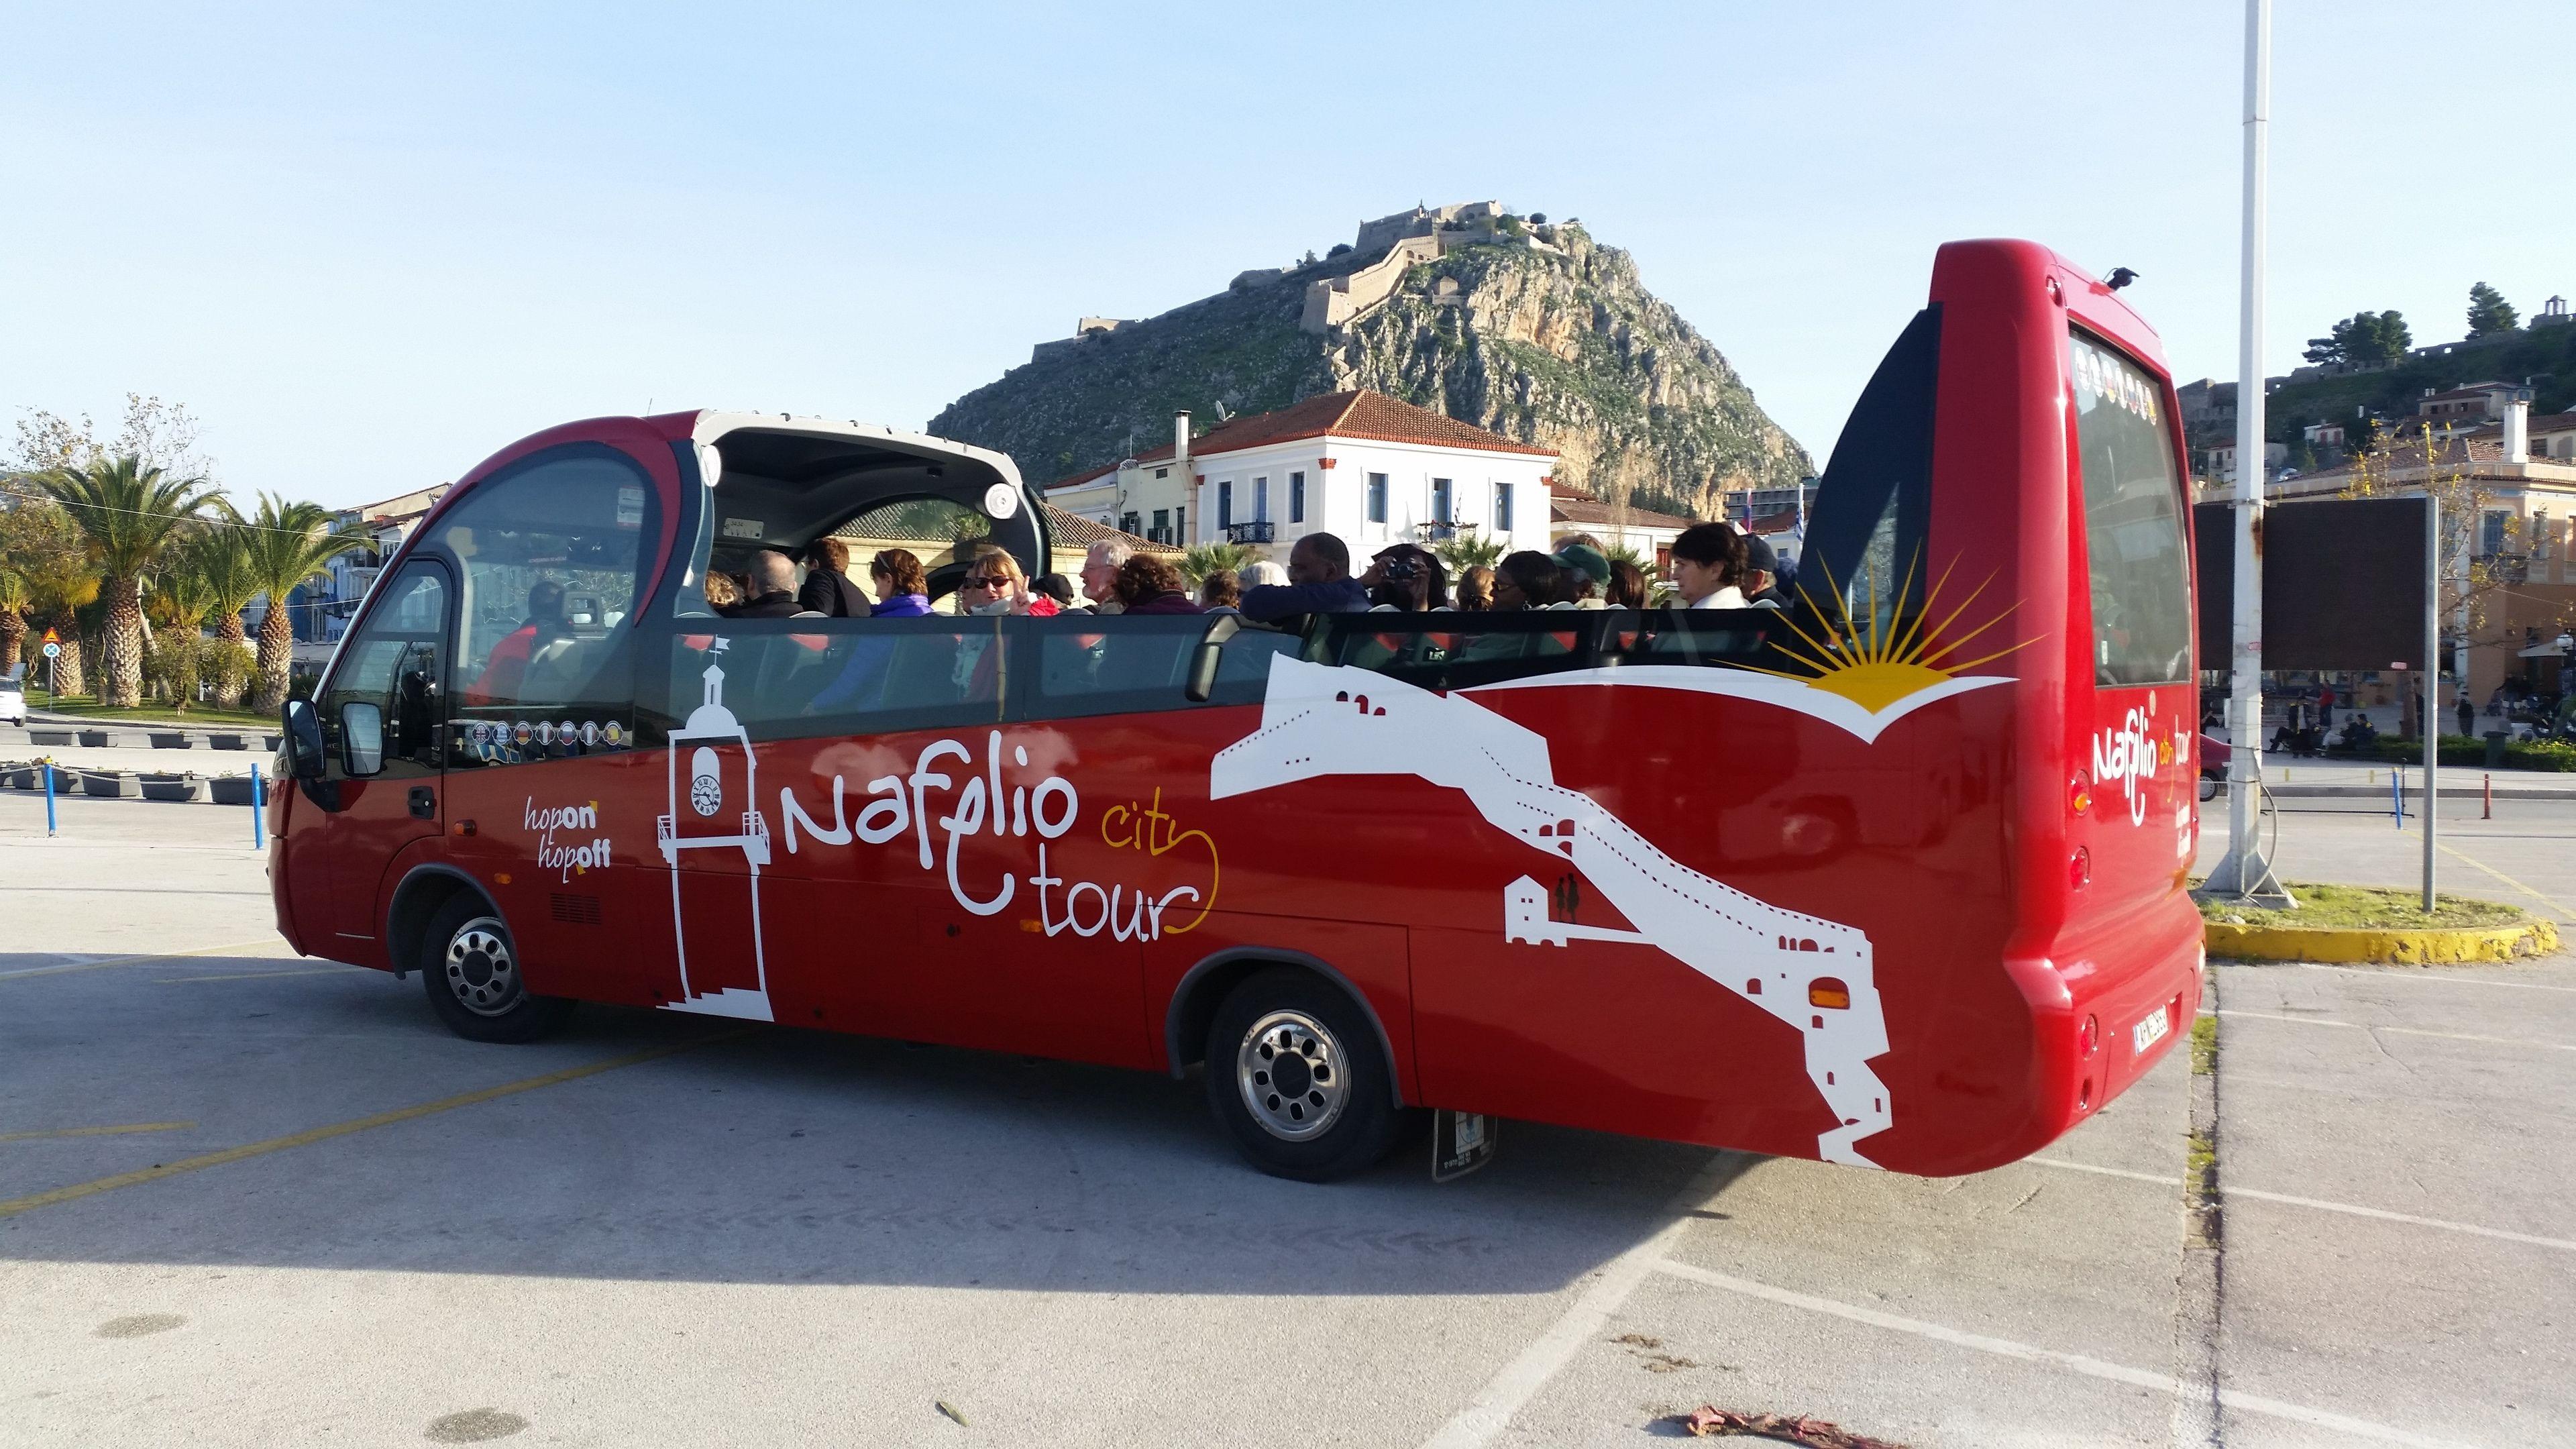 Nafplio hop on hop off city tour